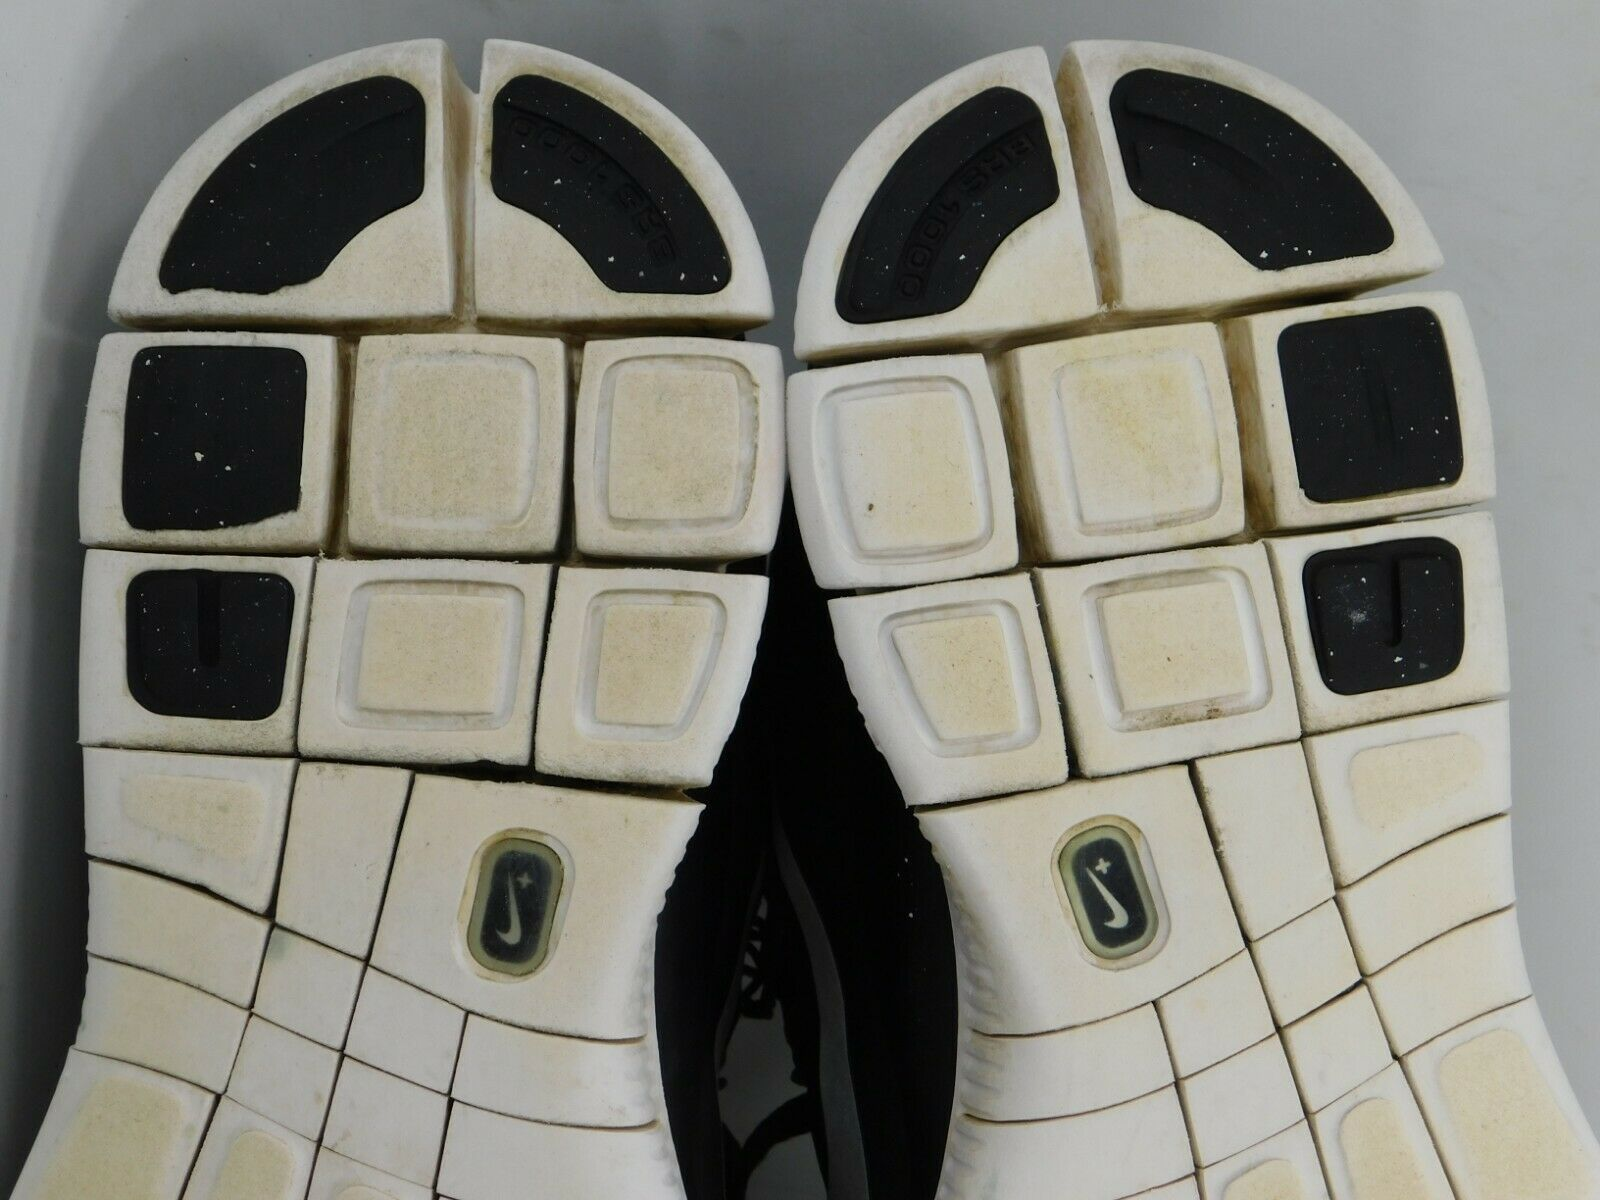 Nike Free 5.0+ Size US 9.5 M (D) EU 41 Women's Running Shoes Black 580591-002 image 9